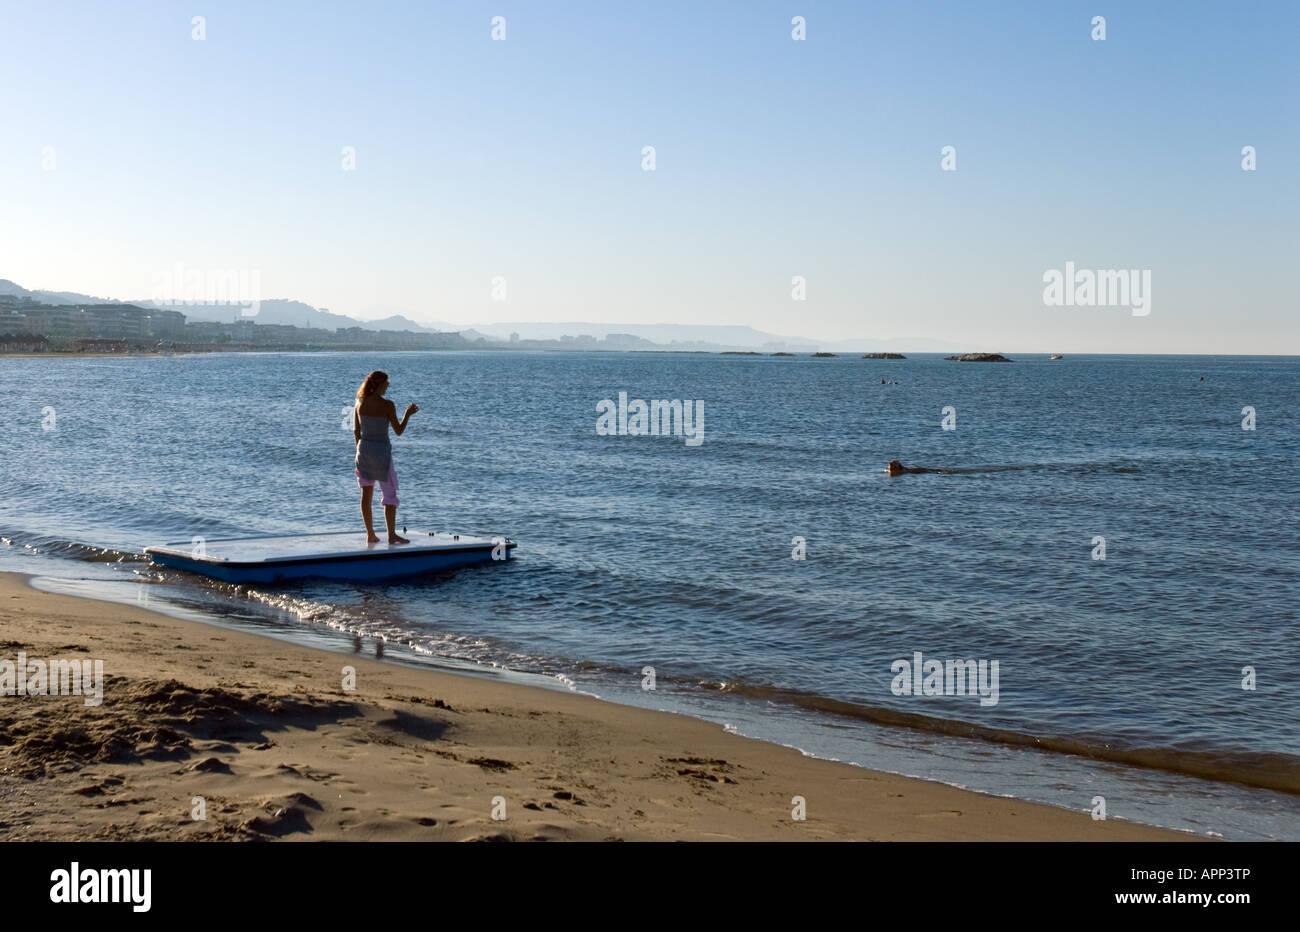 Pescara Strand italien pescara strand stockfoto bild 15838101 alamy